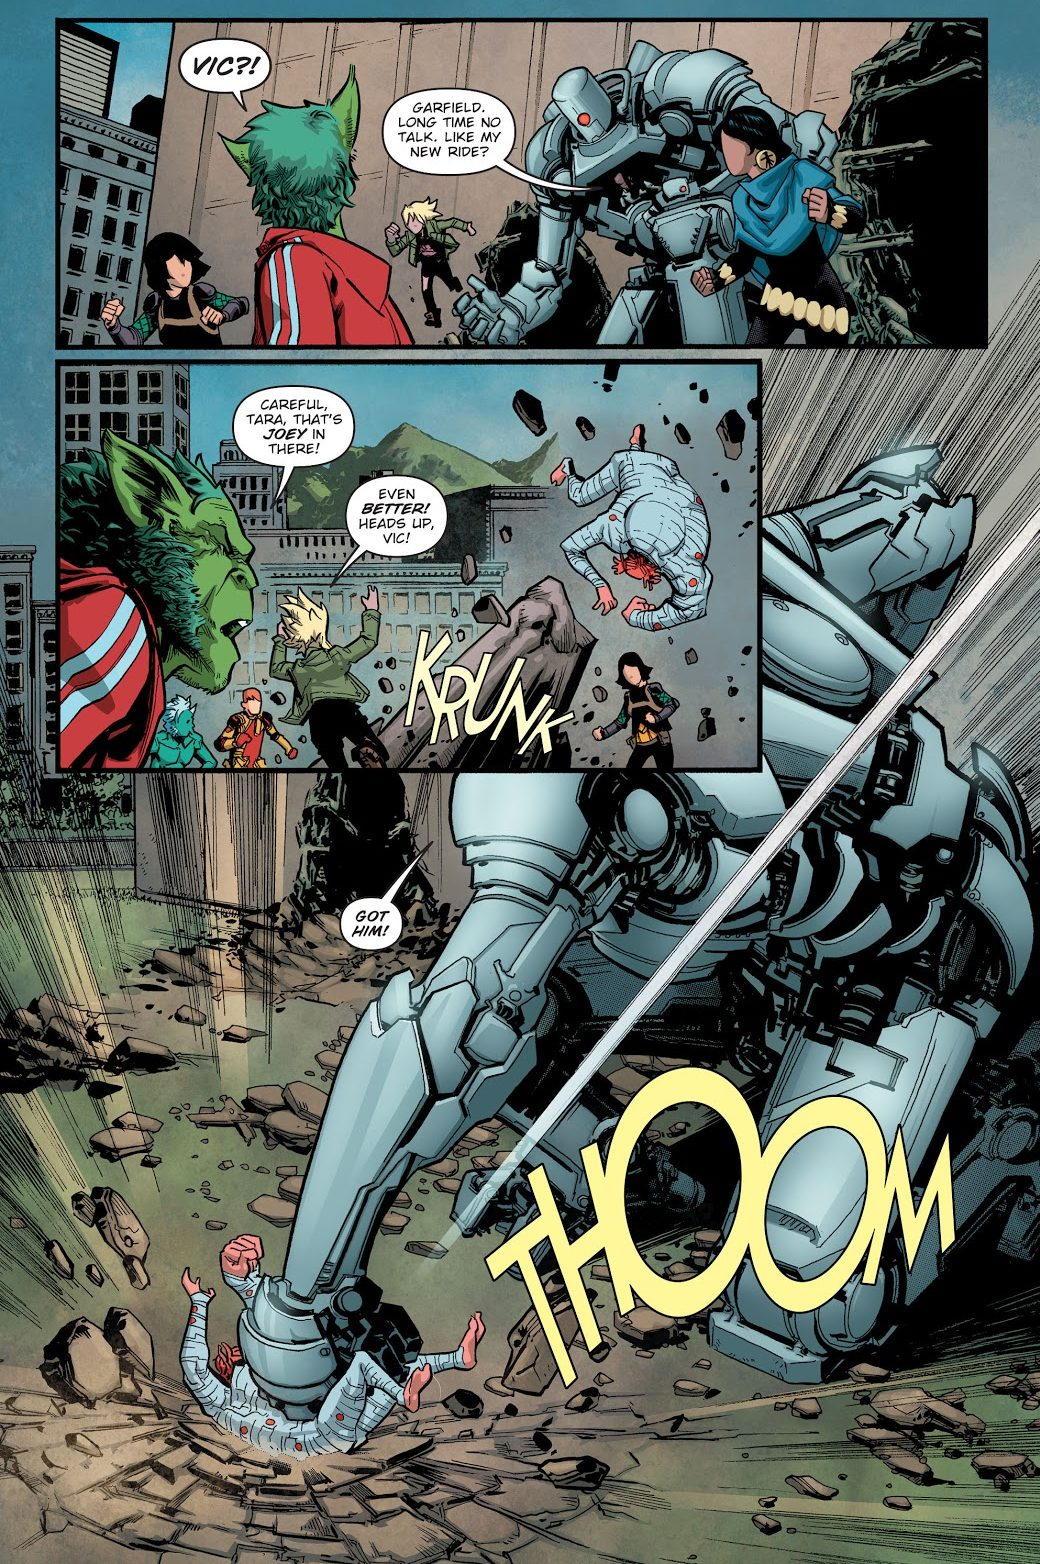 Jericho Takes Control Of Blackfire (Earth 1)